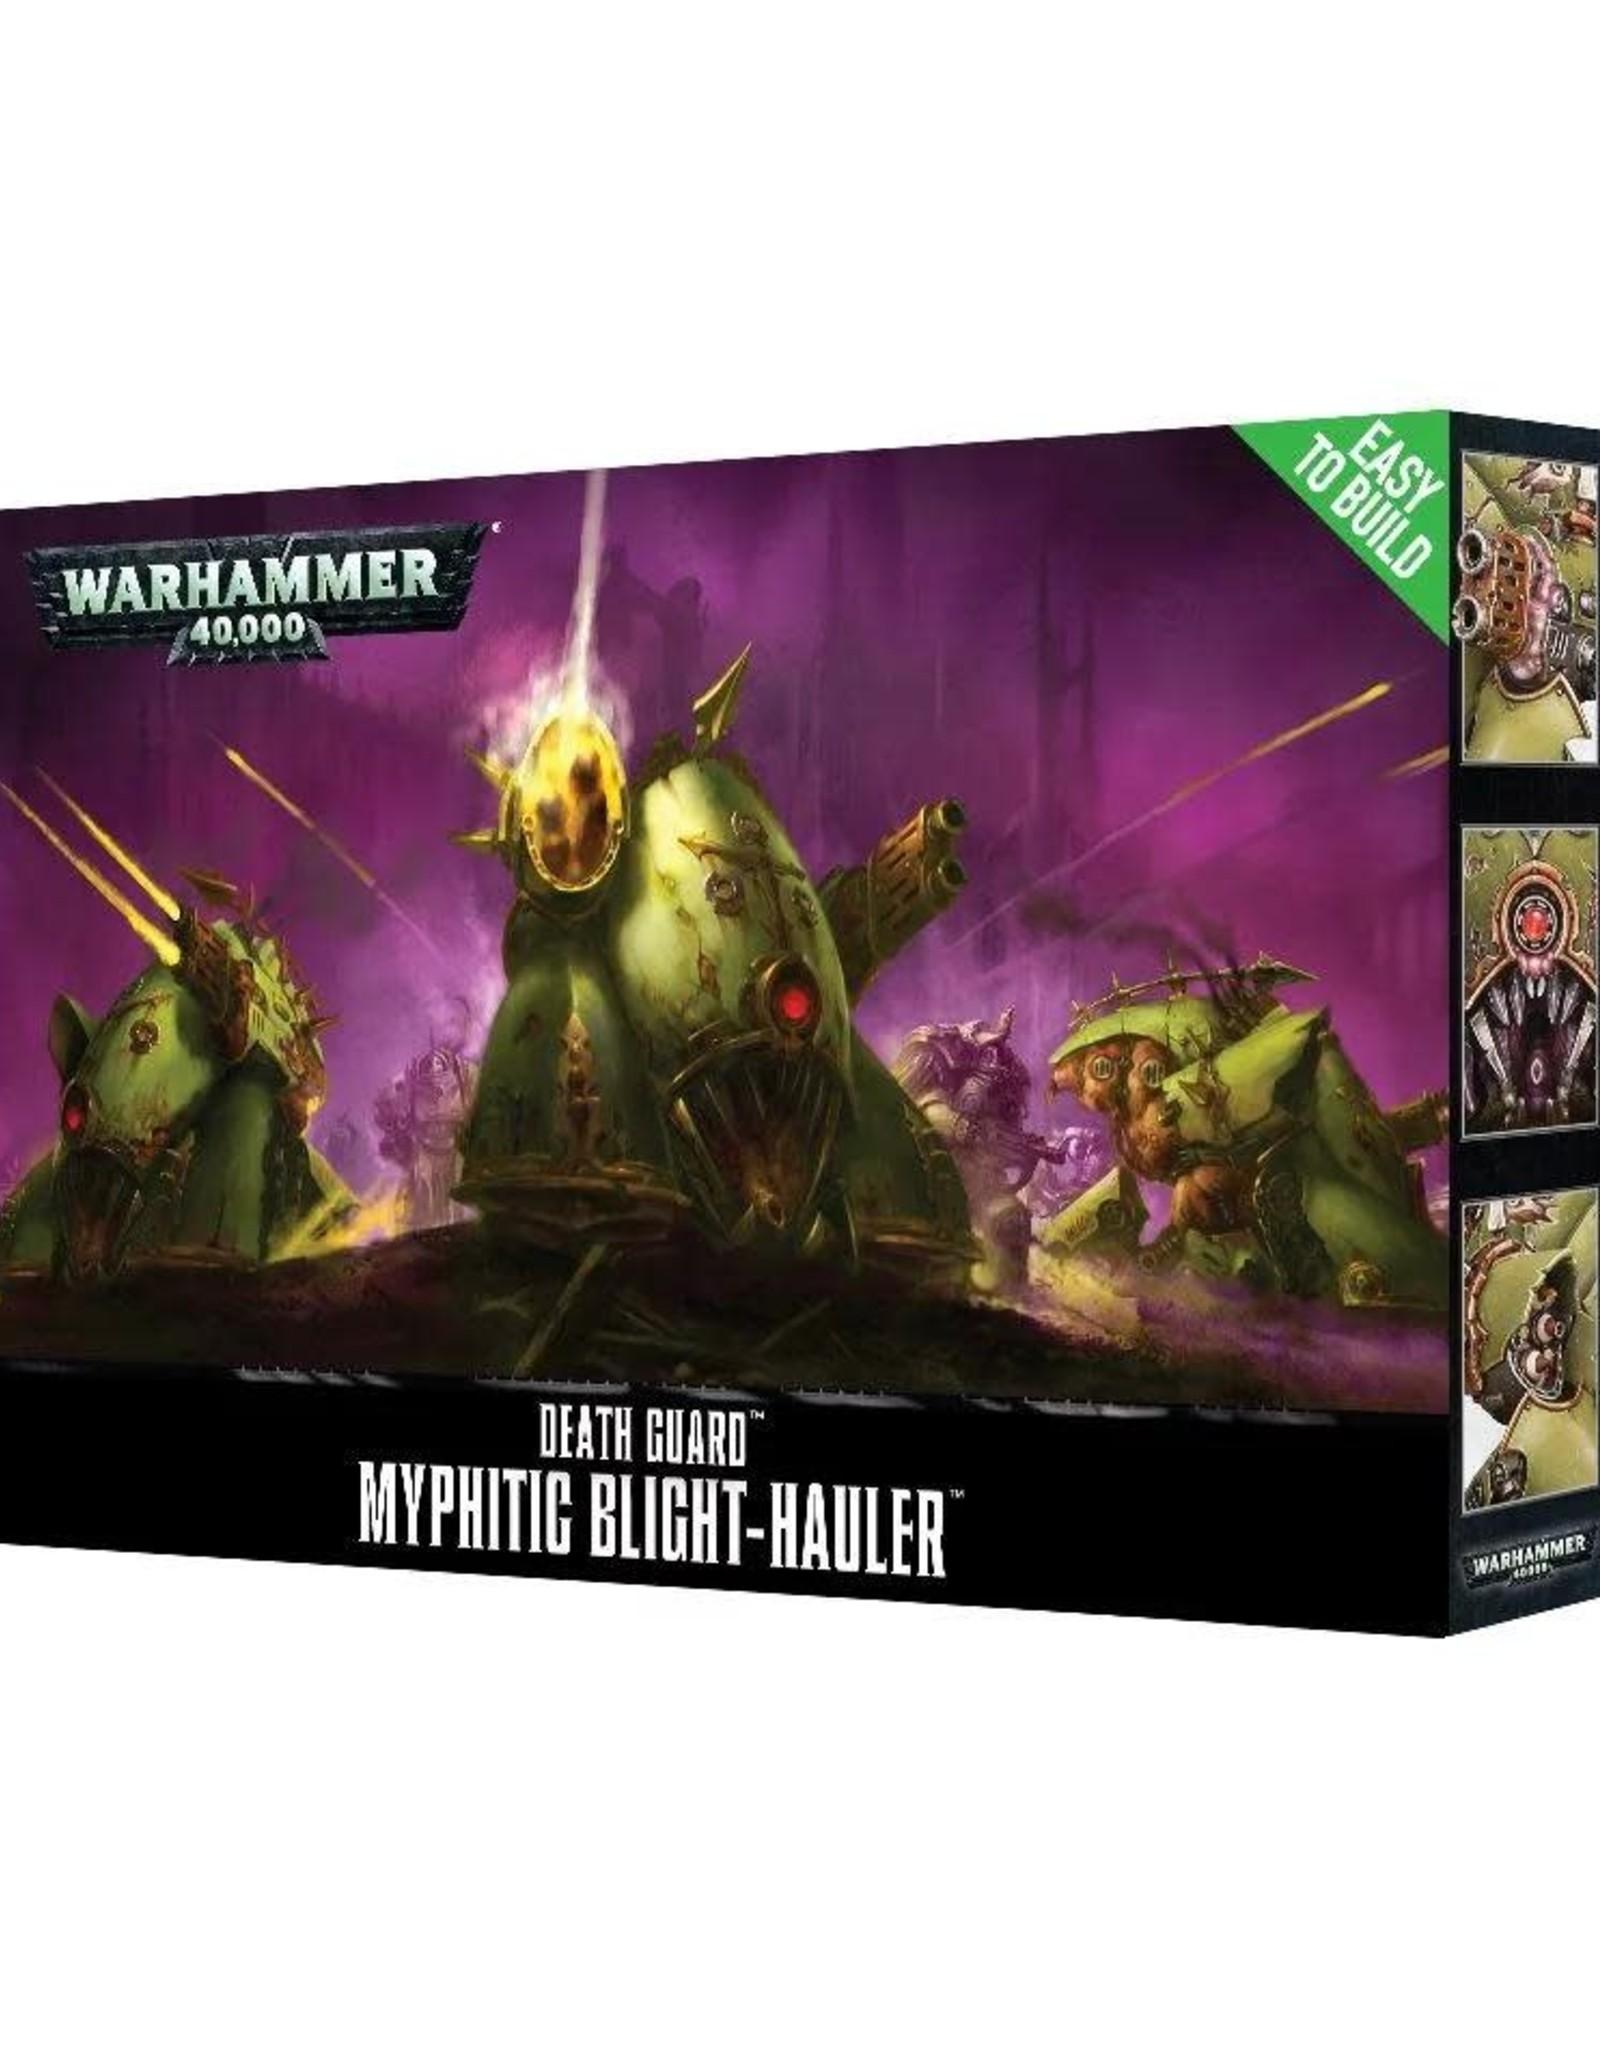 Warhammer 40K ETB: Death Guard Myphitic Blight-Hauler